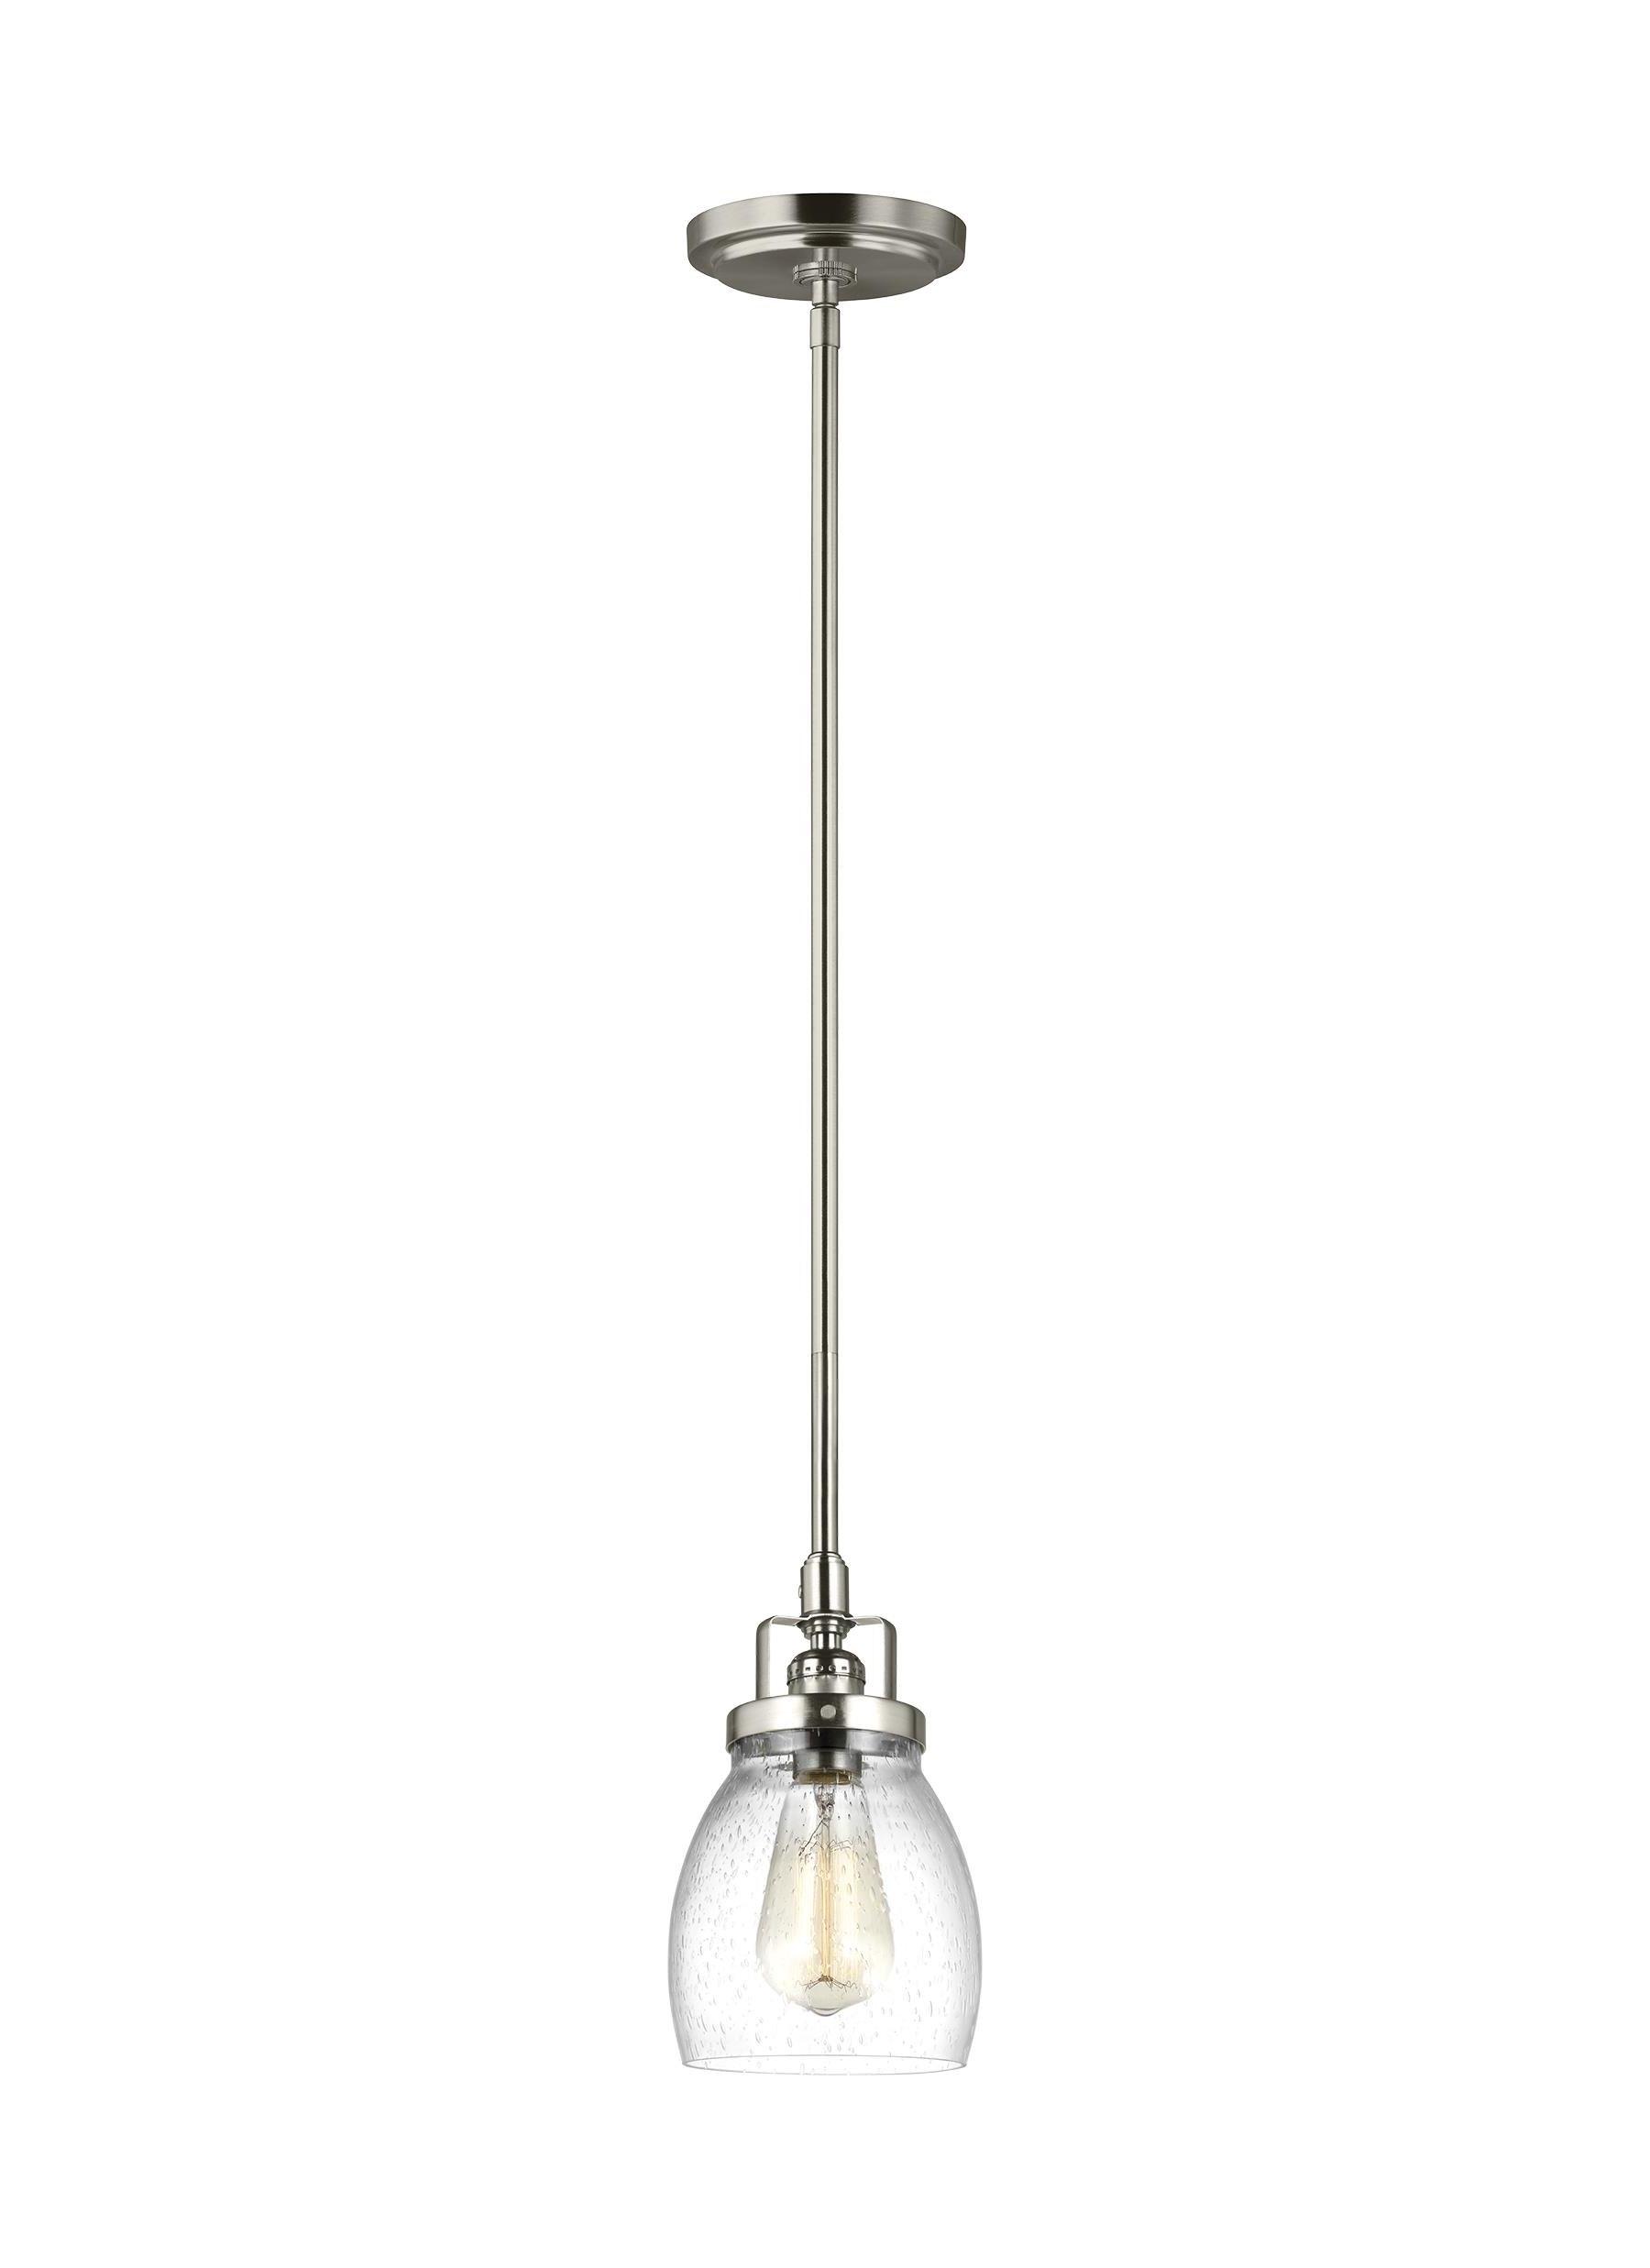 Houon 1 Light Cone Bell Pendant Pertaining To 2020 Bundaberg 1 Light Single Bell Pendants (View 14 of 20)